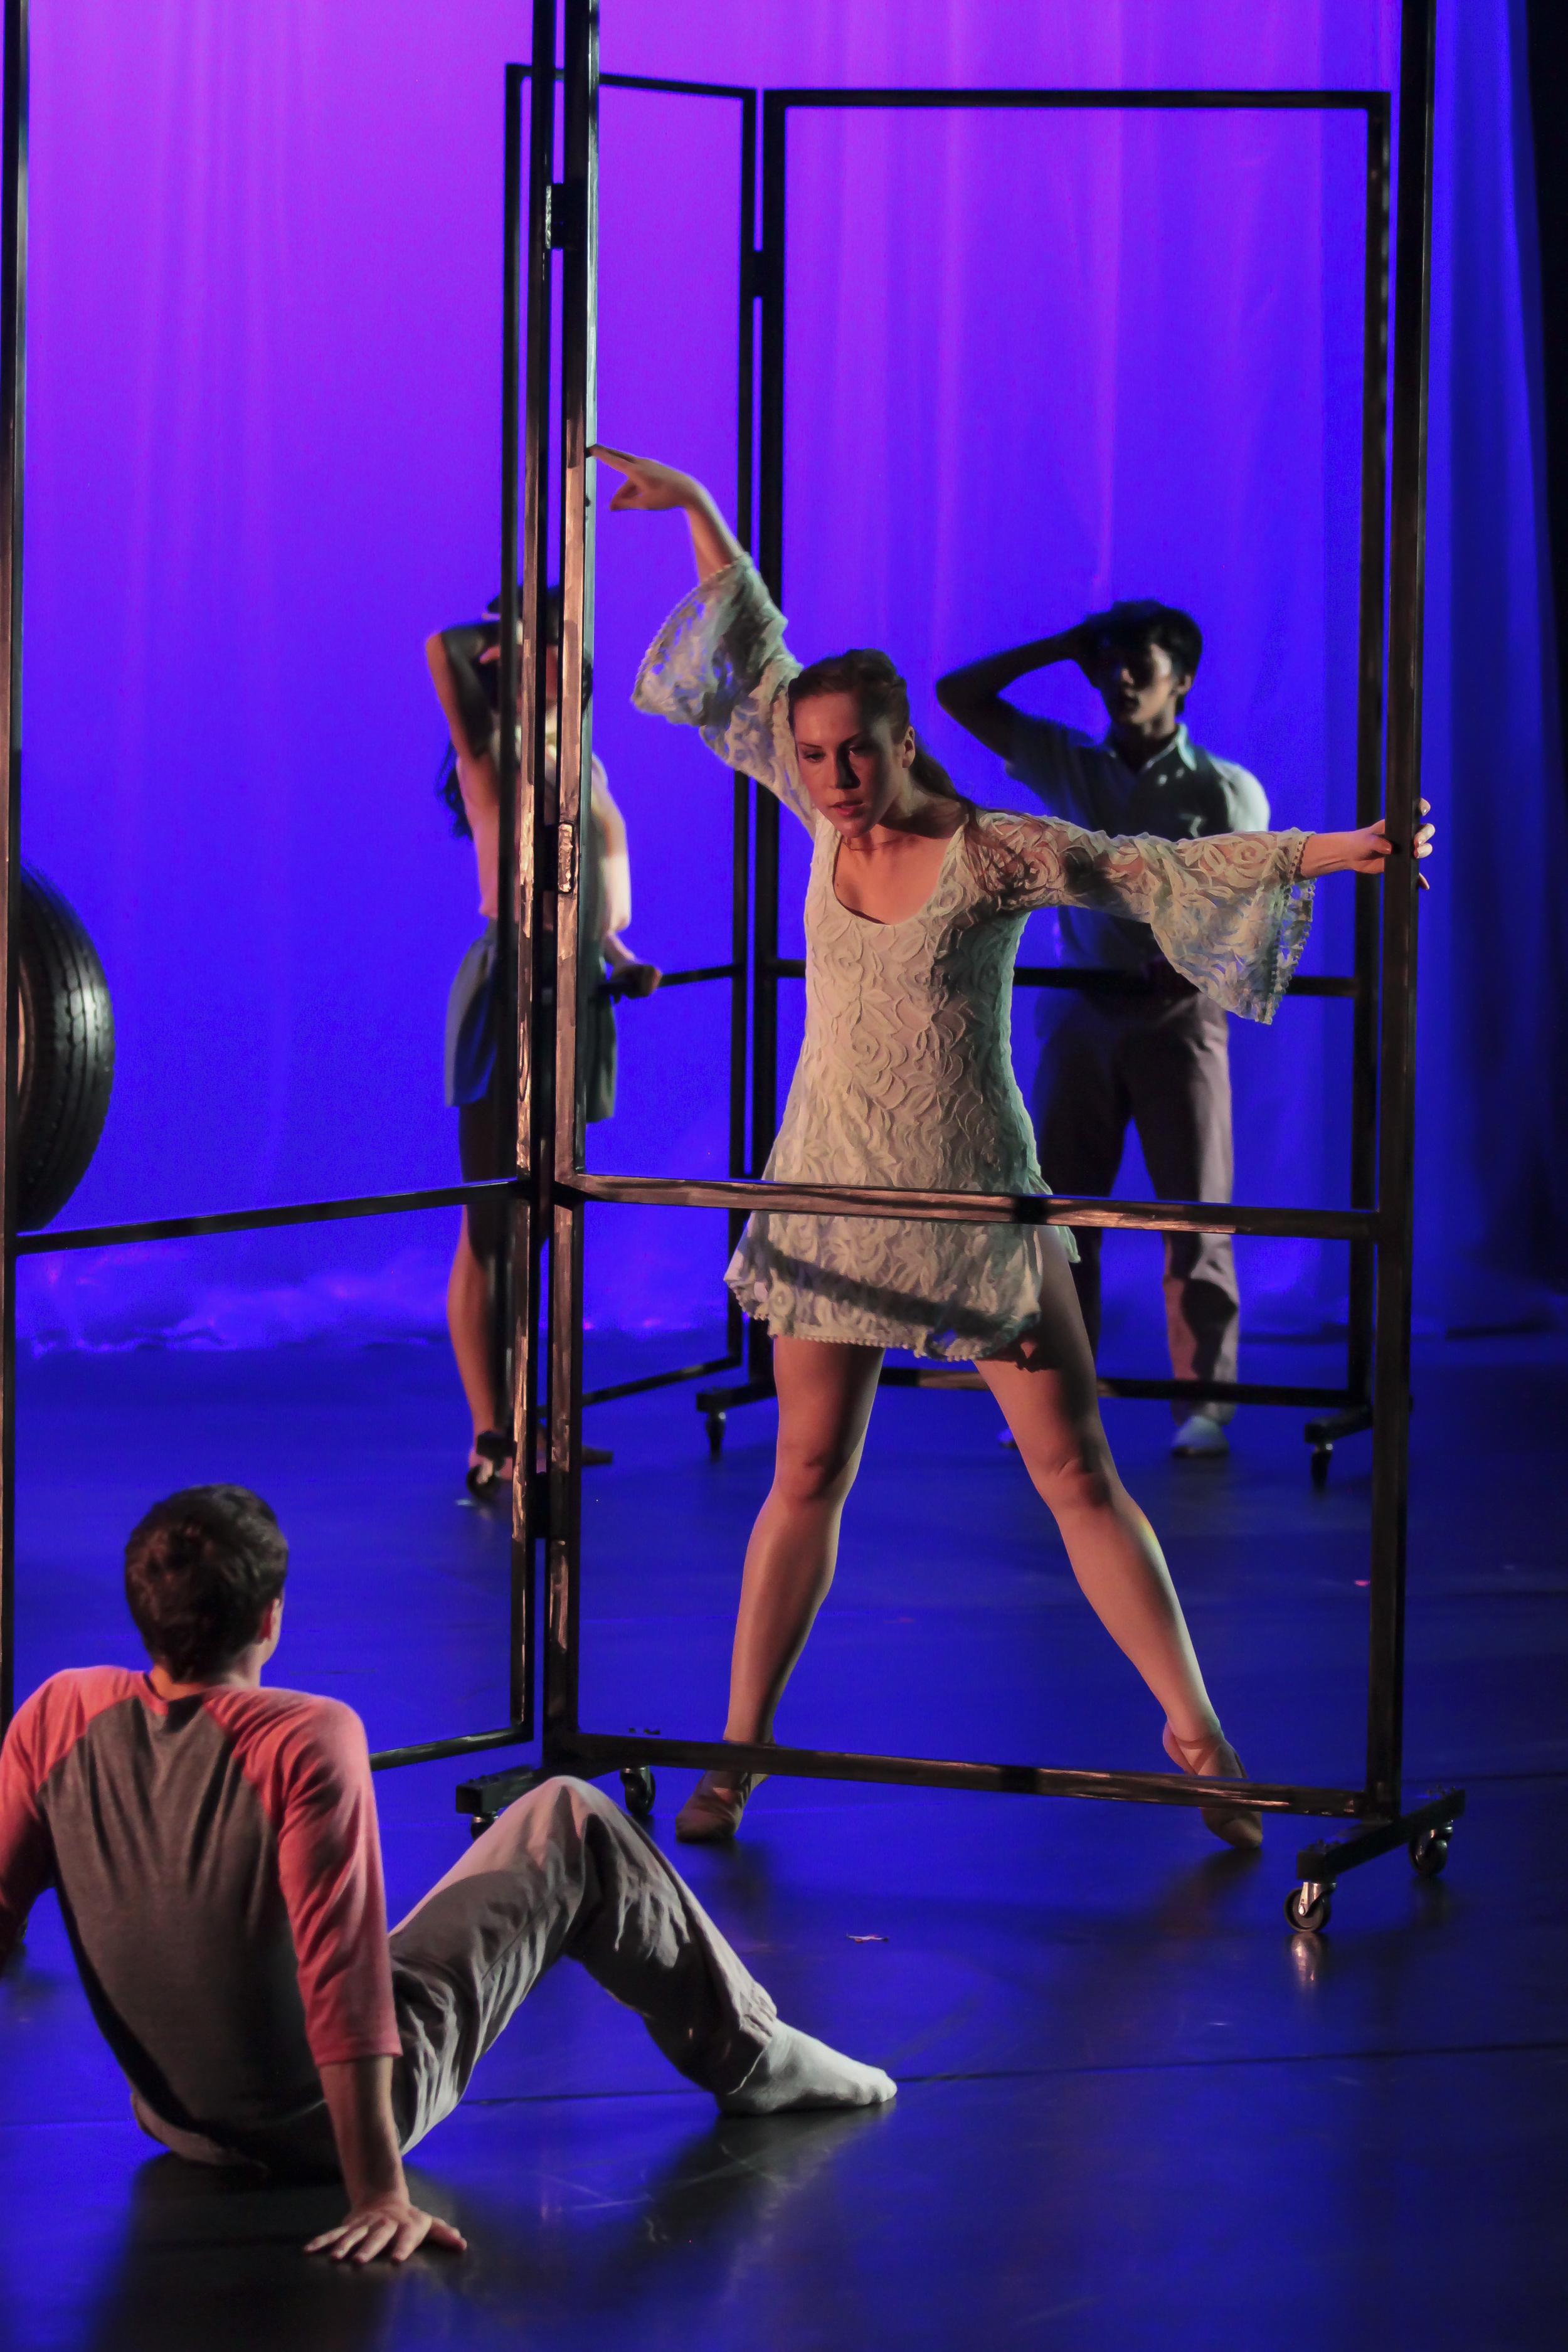 andy-broomell-scenic-design-dance-personal-mythology-3.jpg